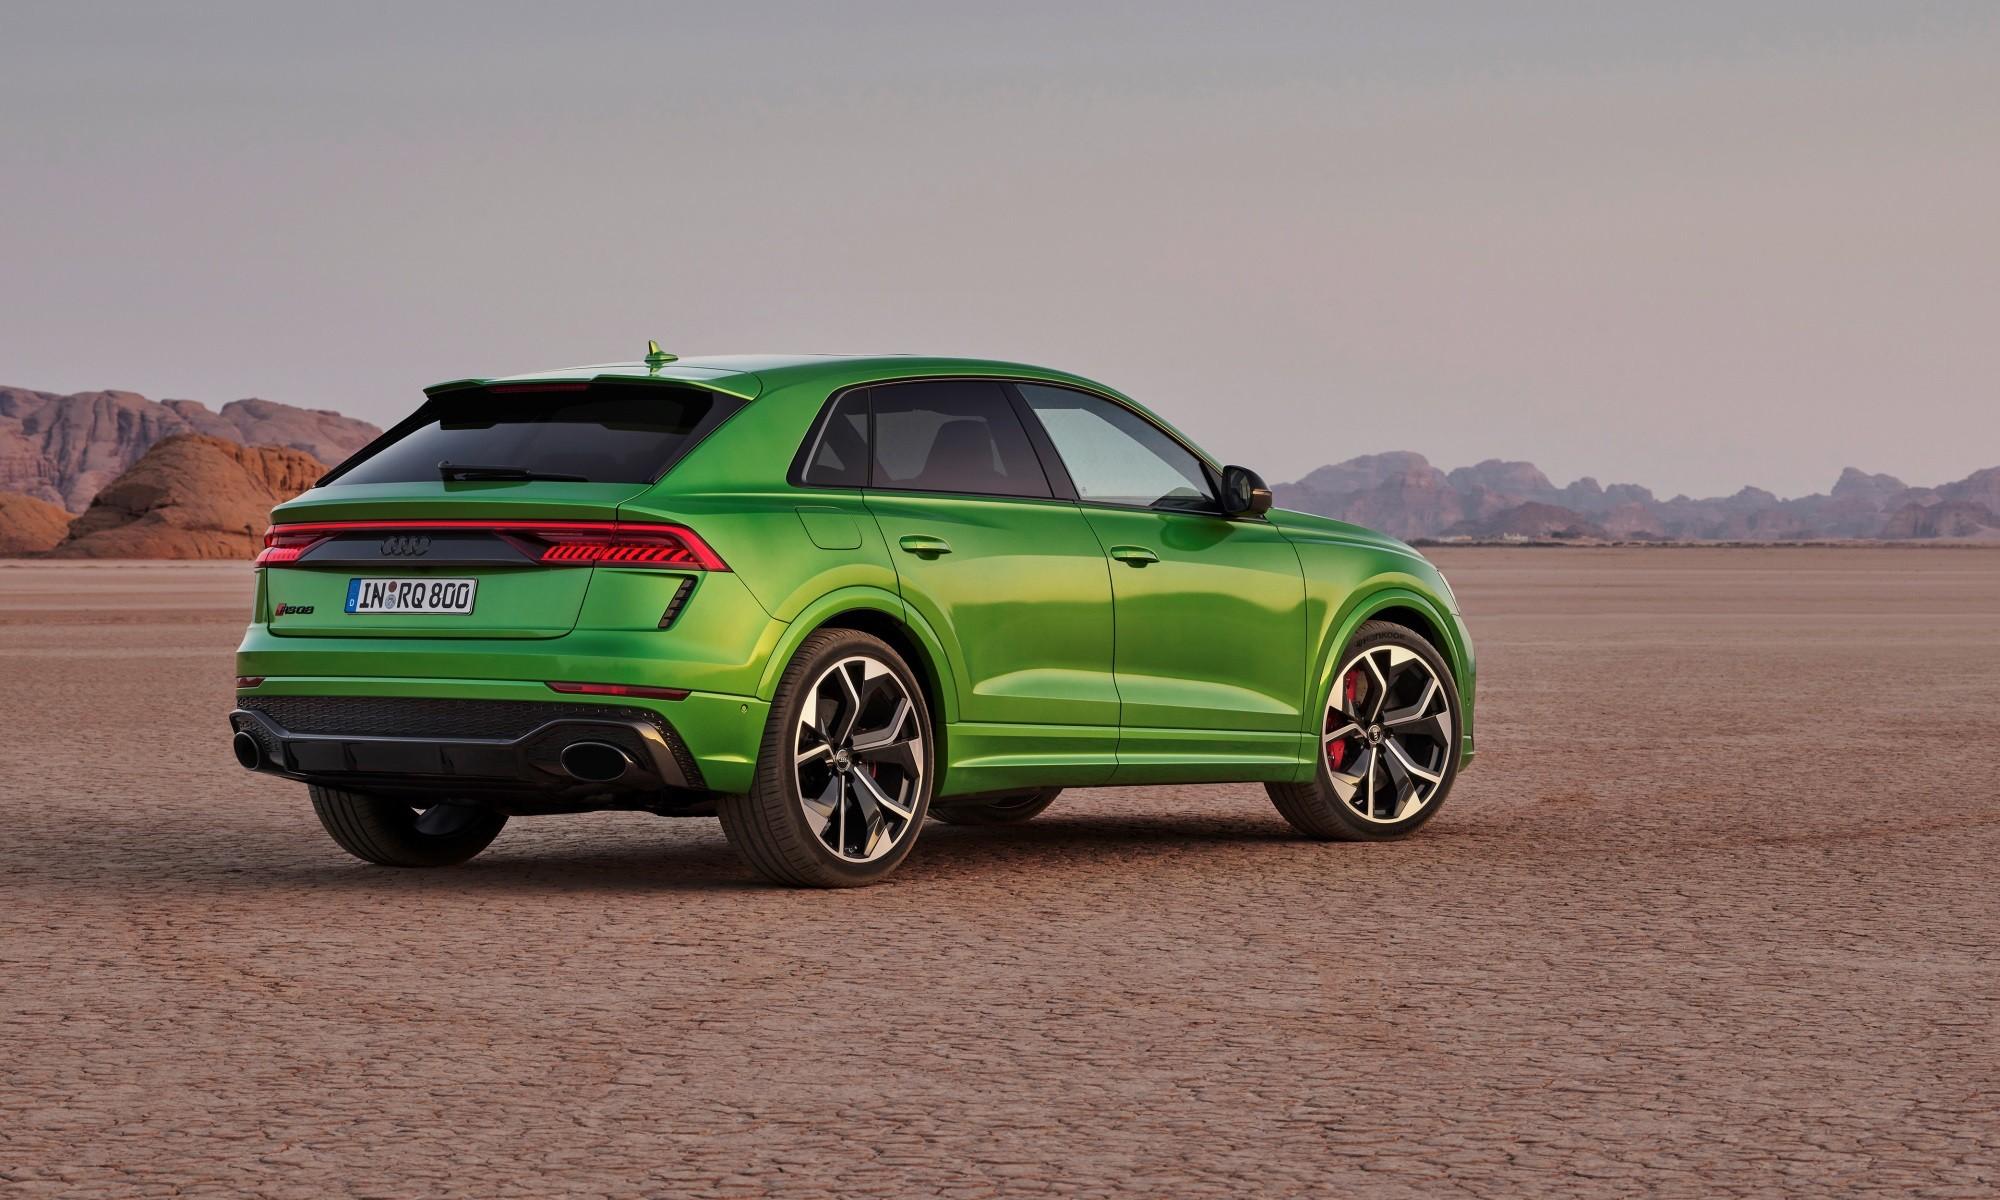 Audi RS Q8 rear